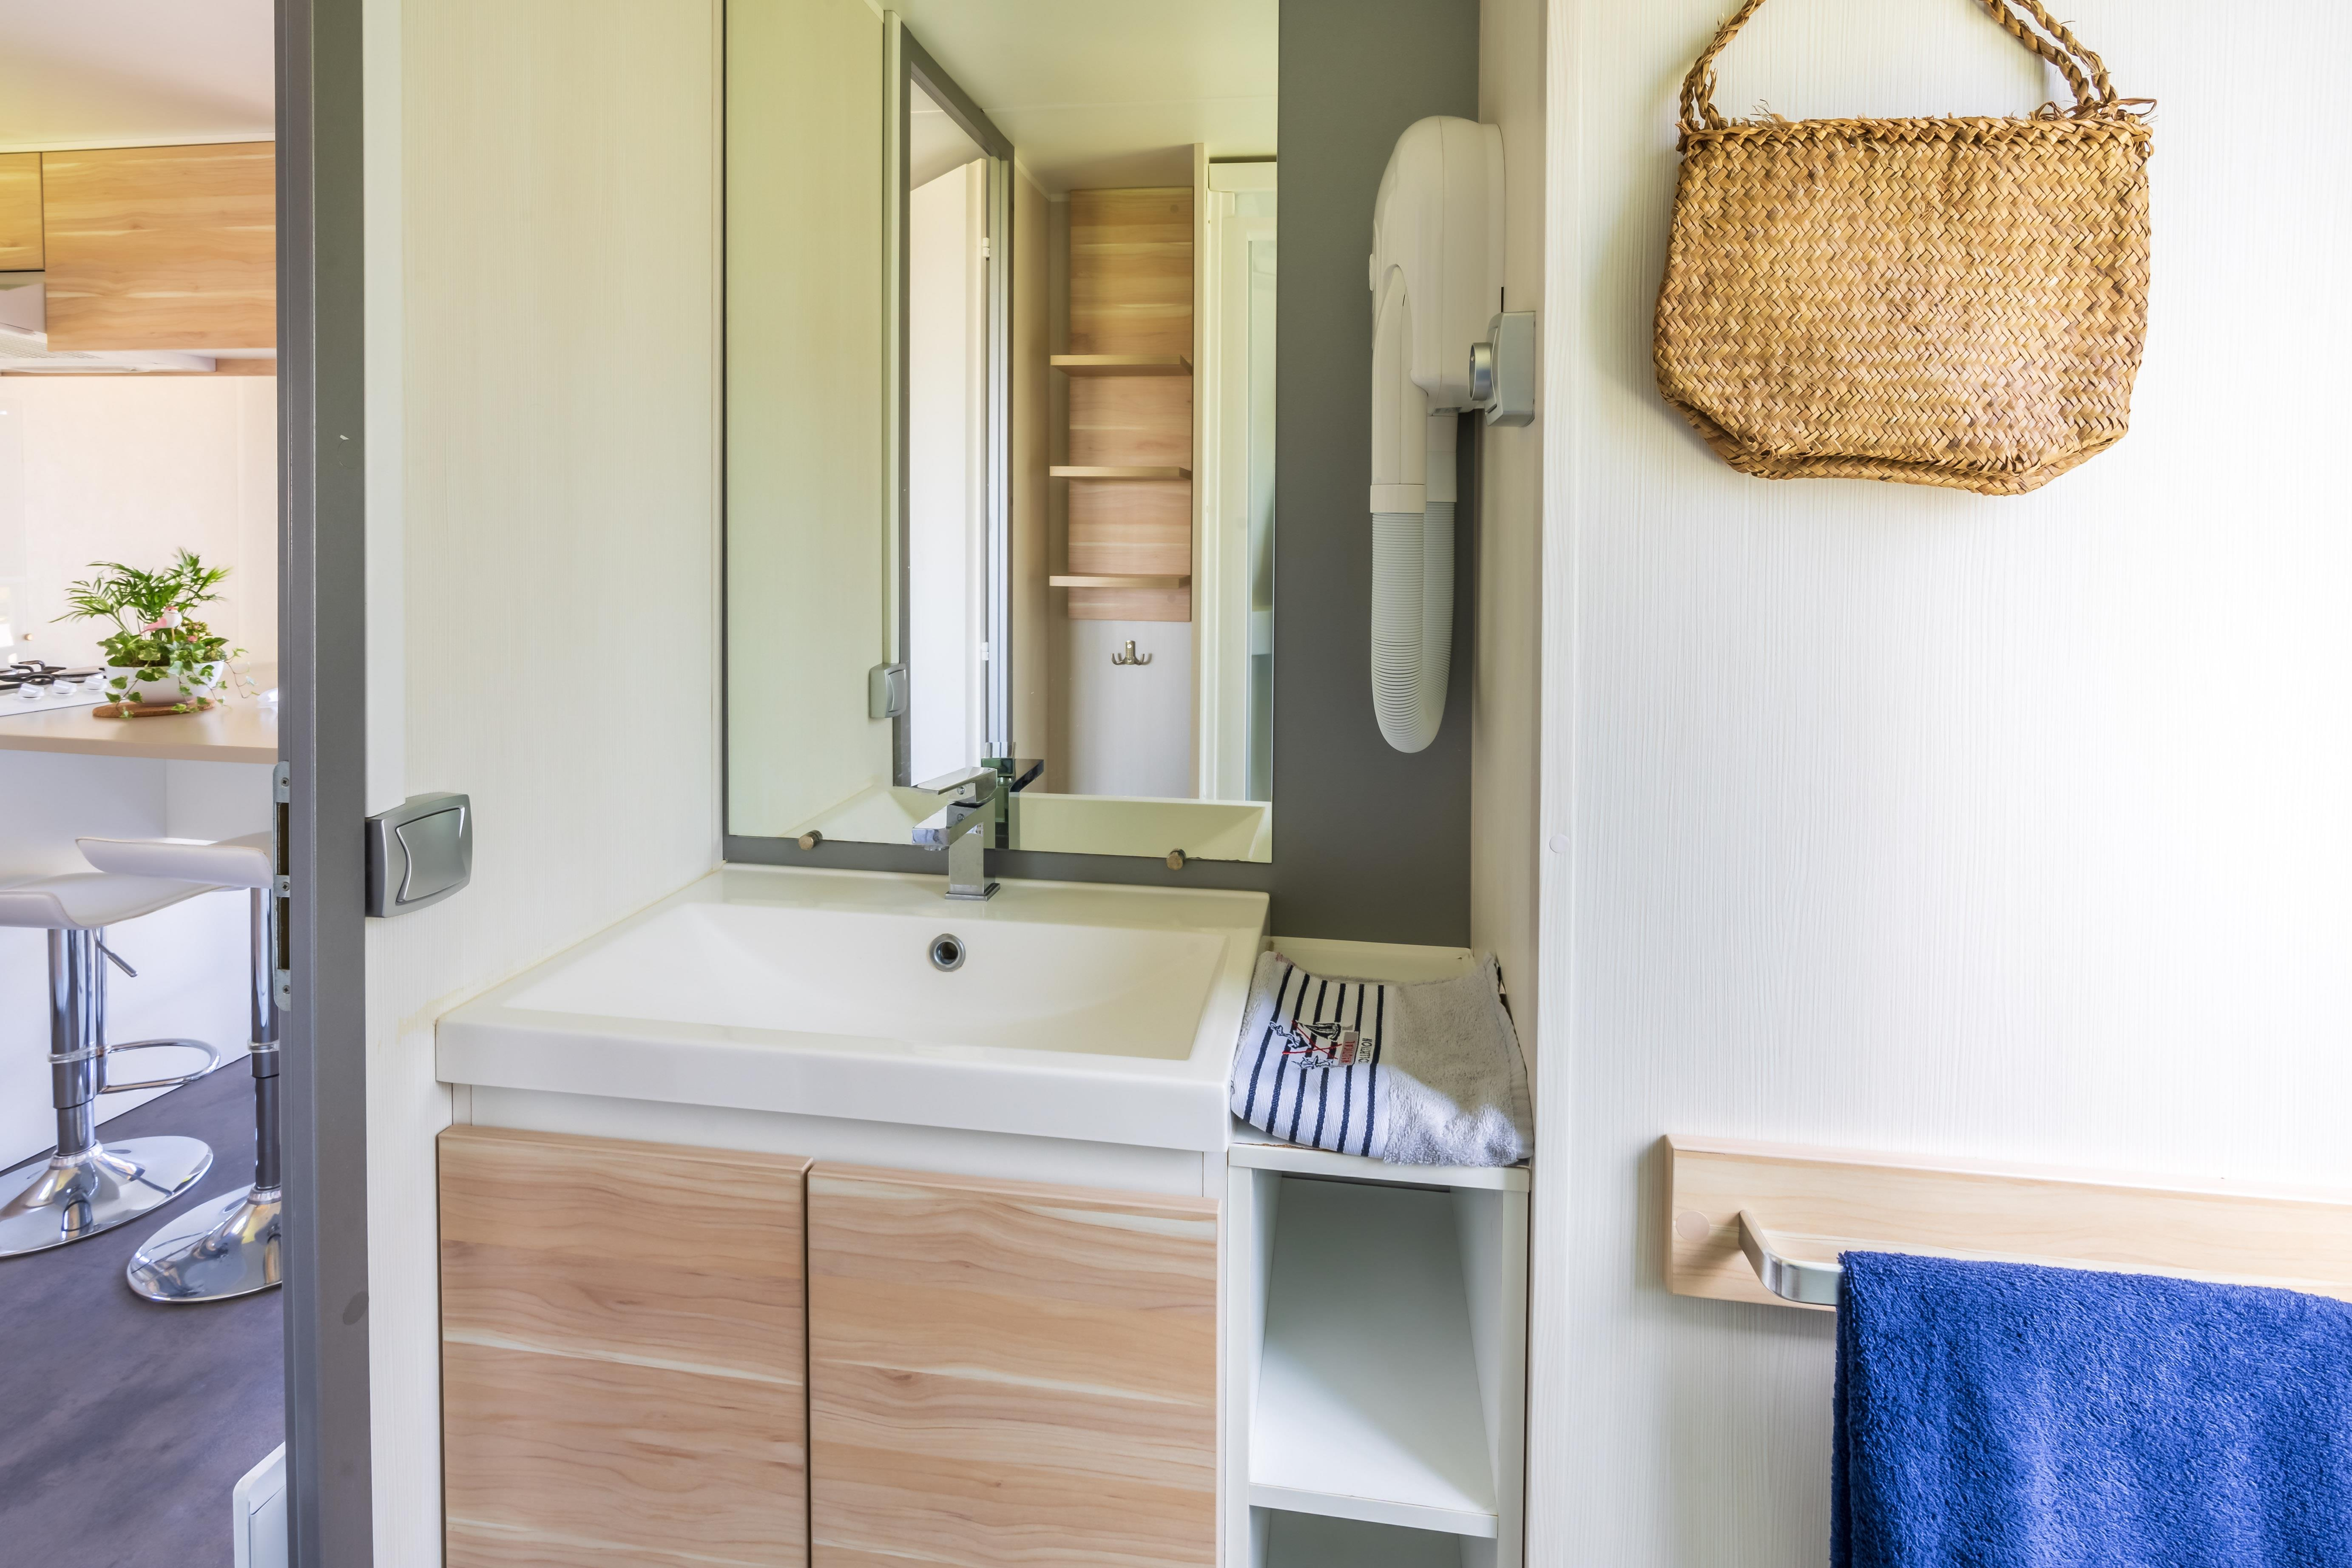 Location - Mobilhome Lumiere Premium Ilot Vue Mer - Camping Locronan